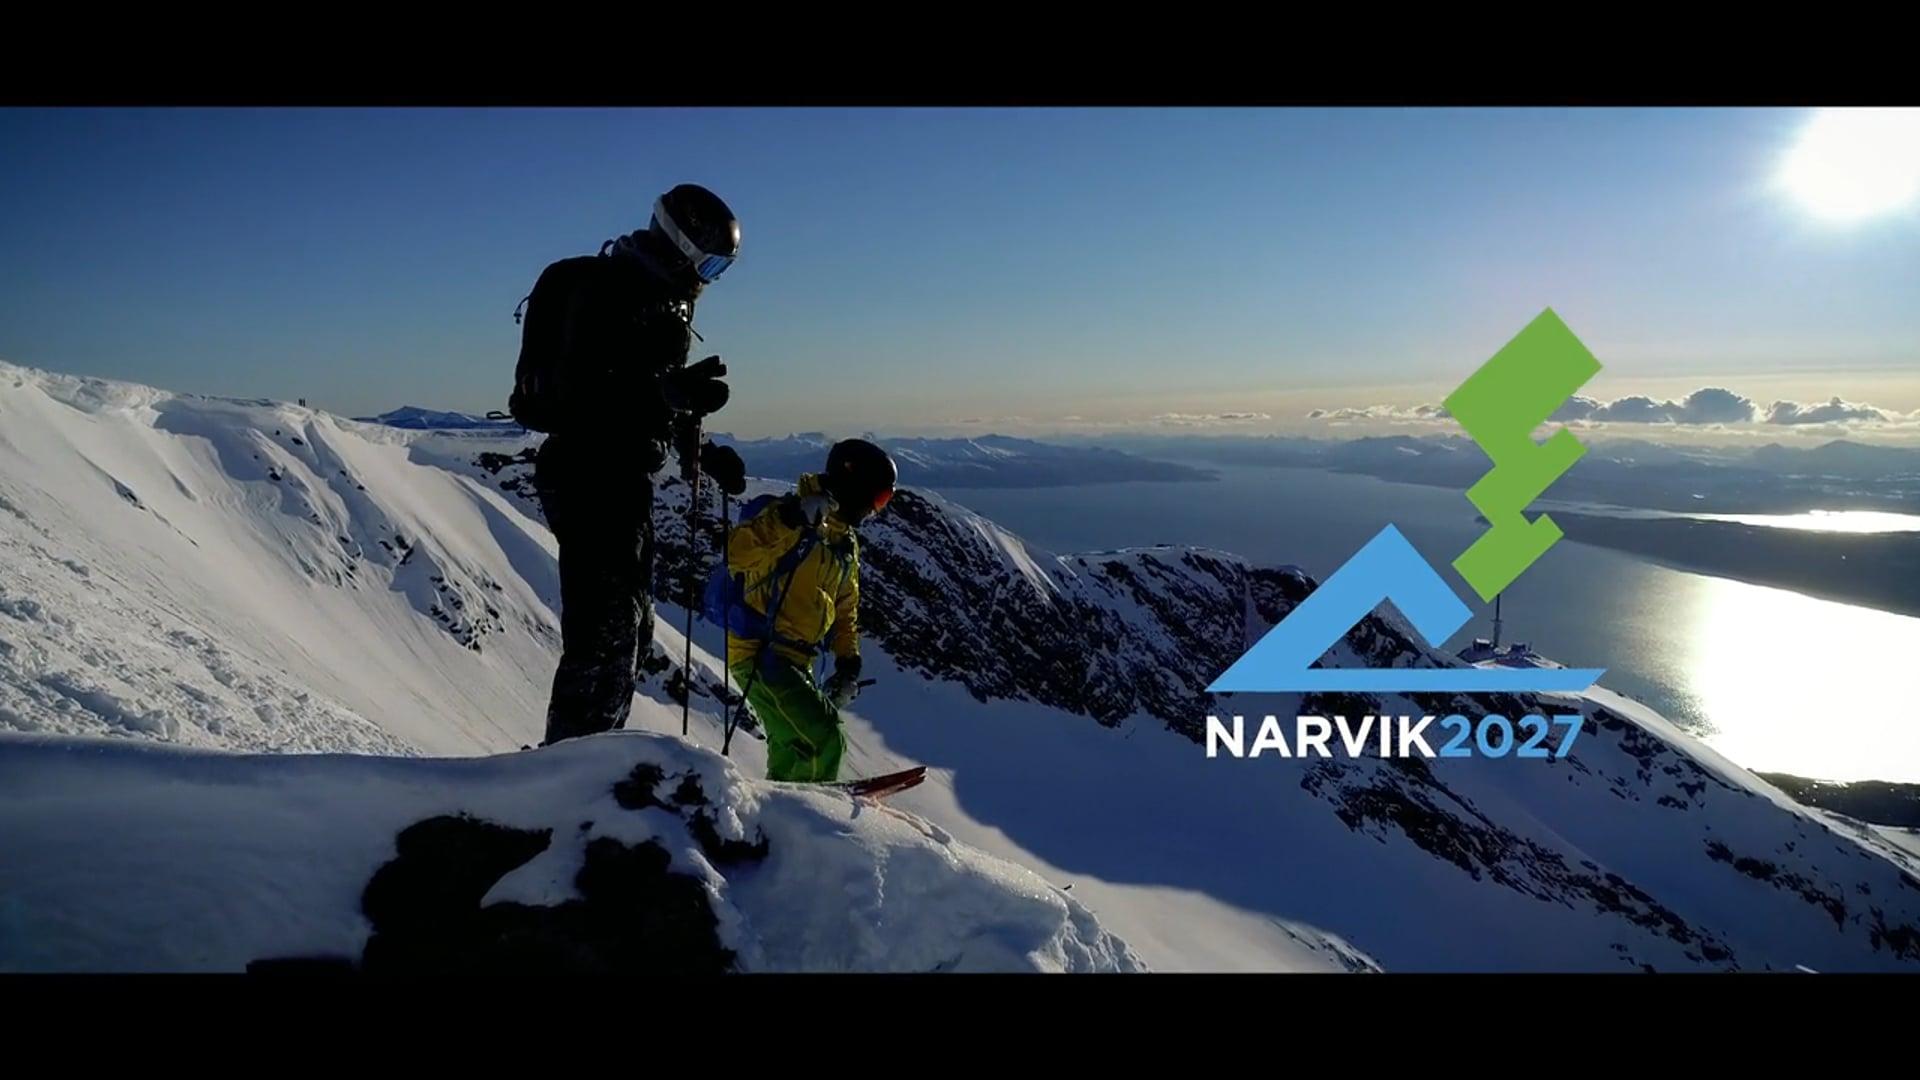 Alpine World Ski Championships 2027 North-Norway